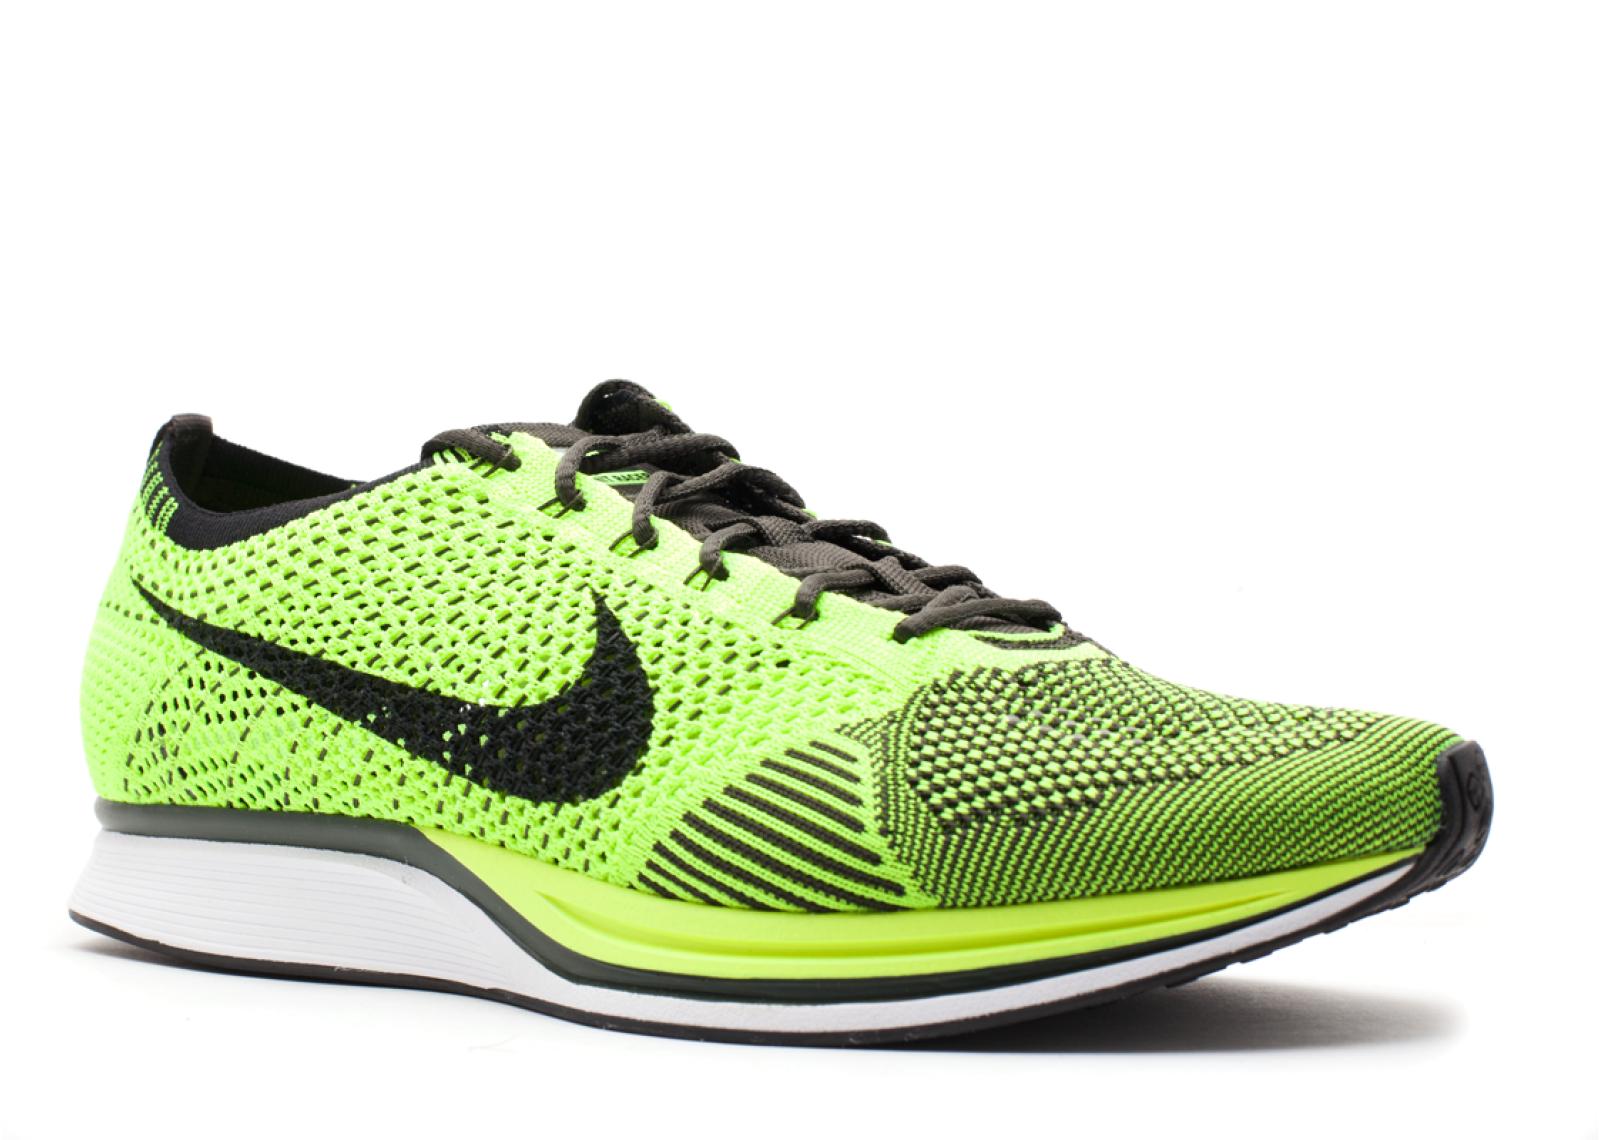 Nike - Men - Flyknit Racer - 526628-721